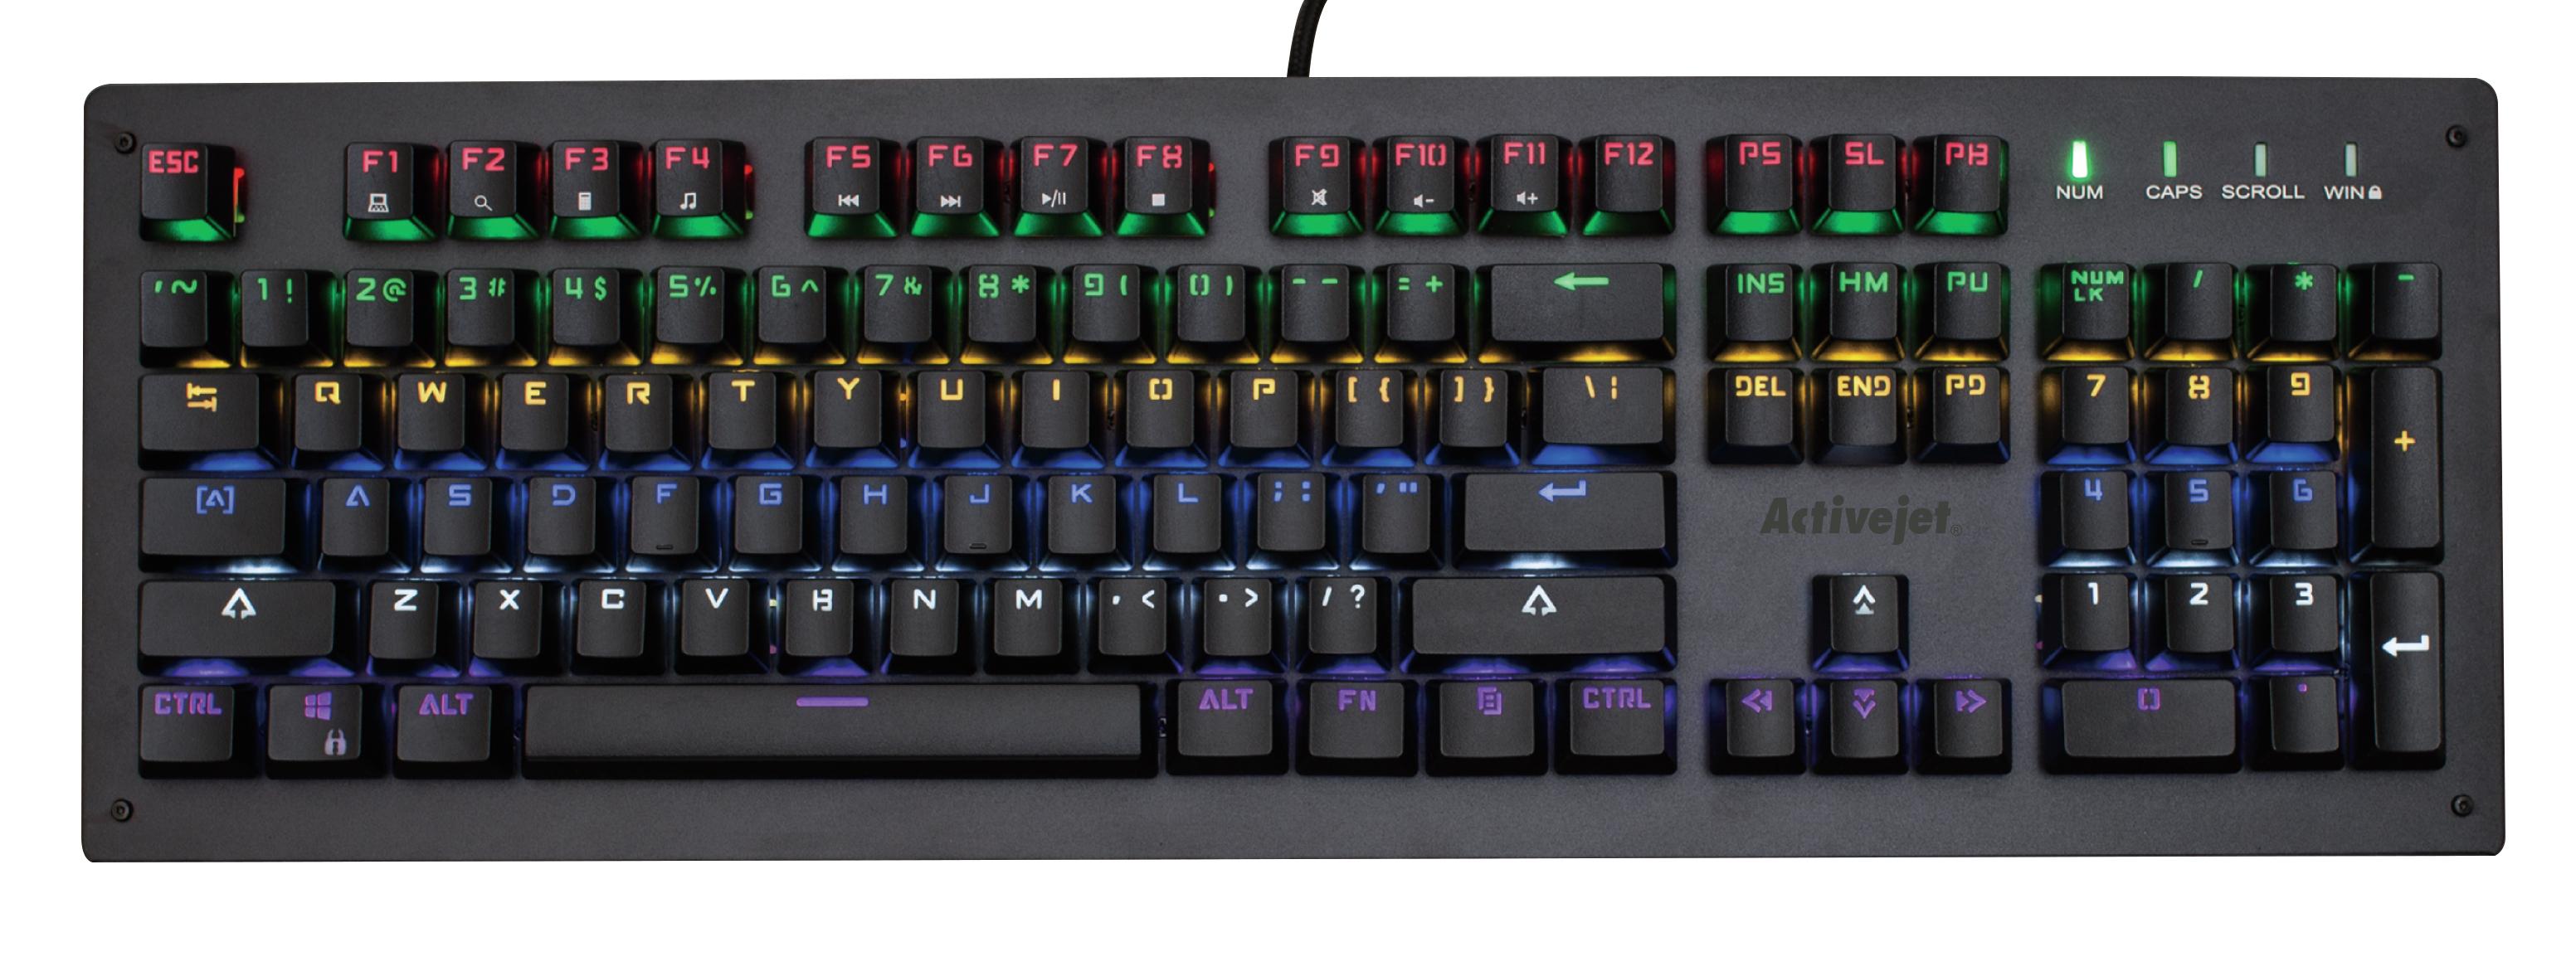 Activejet Klawiatura Mechaniczna Gaming USB K-6002